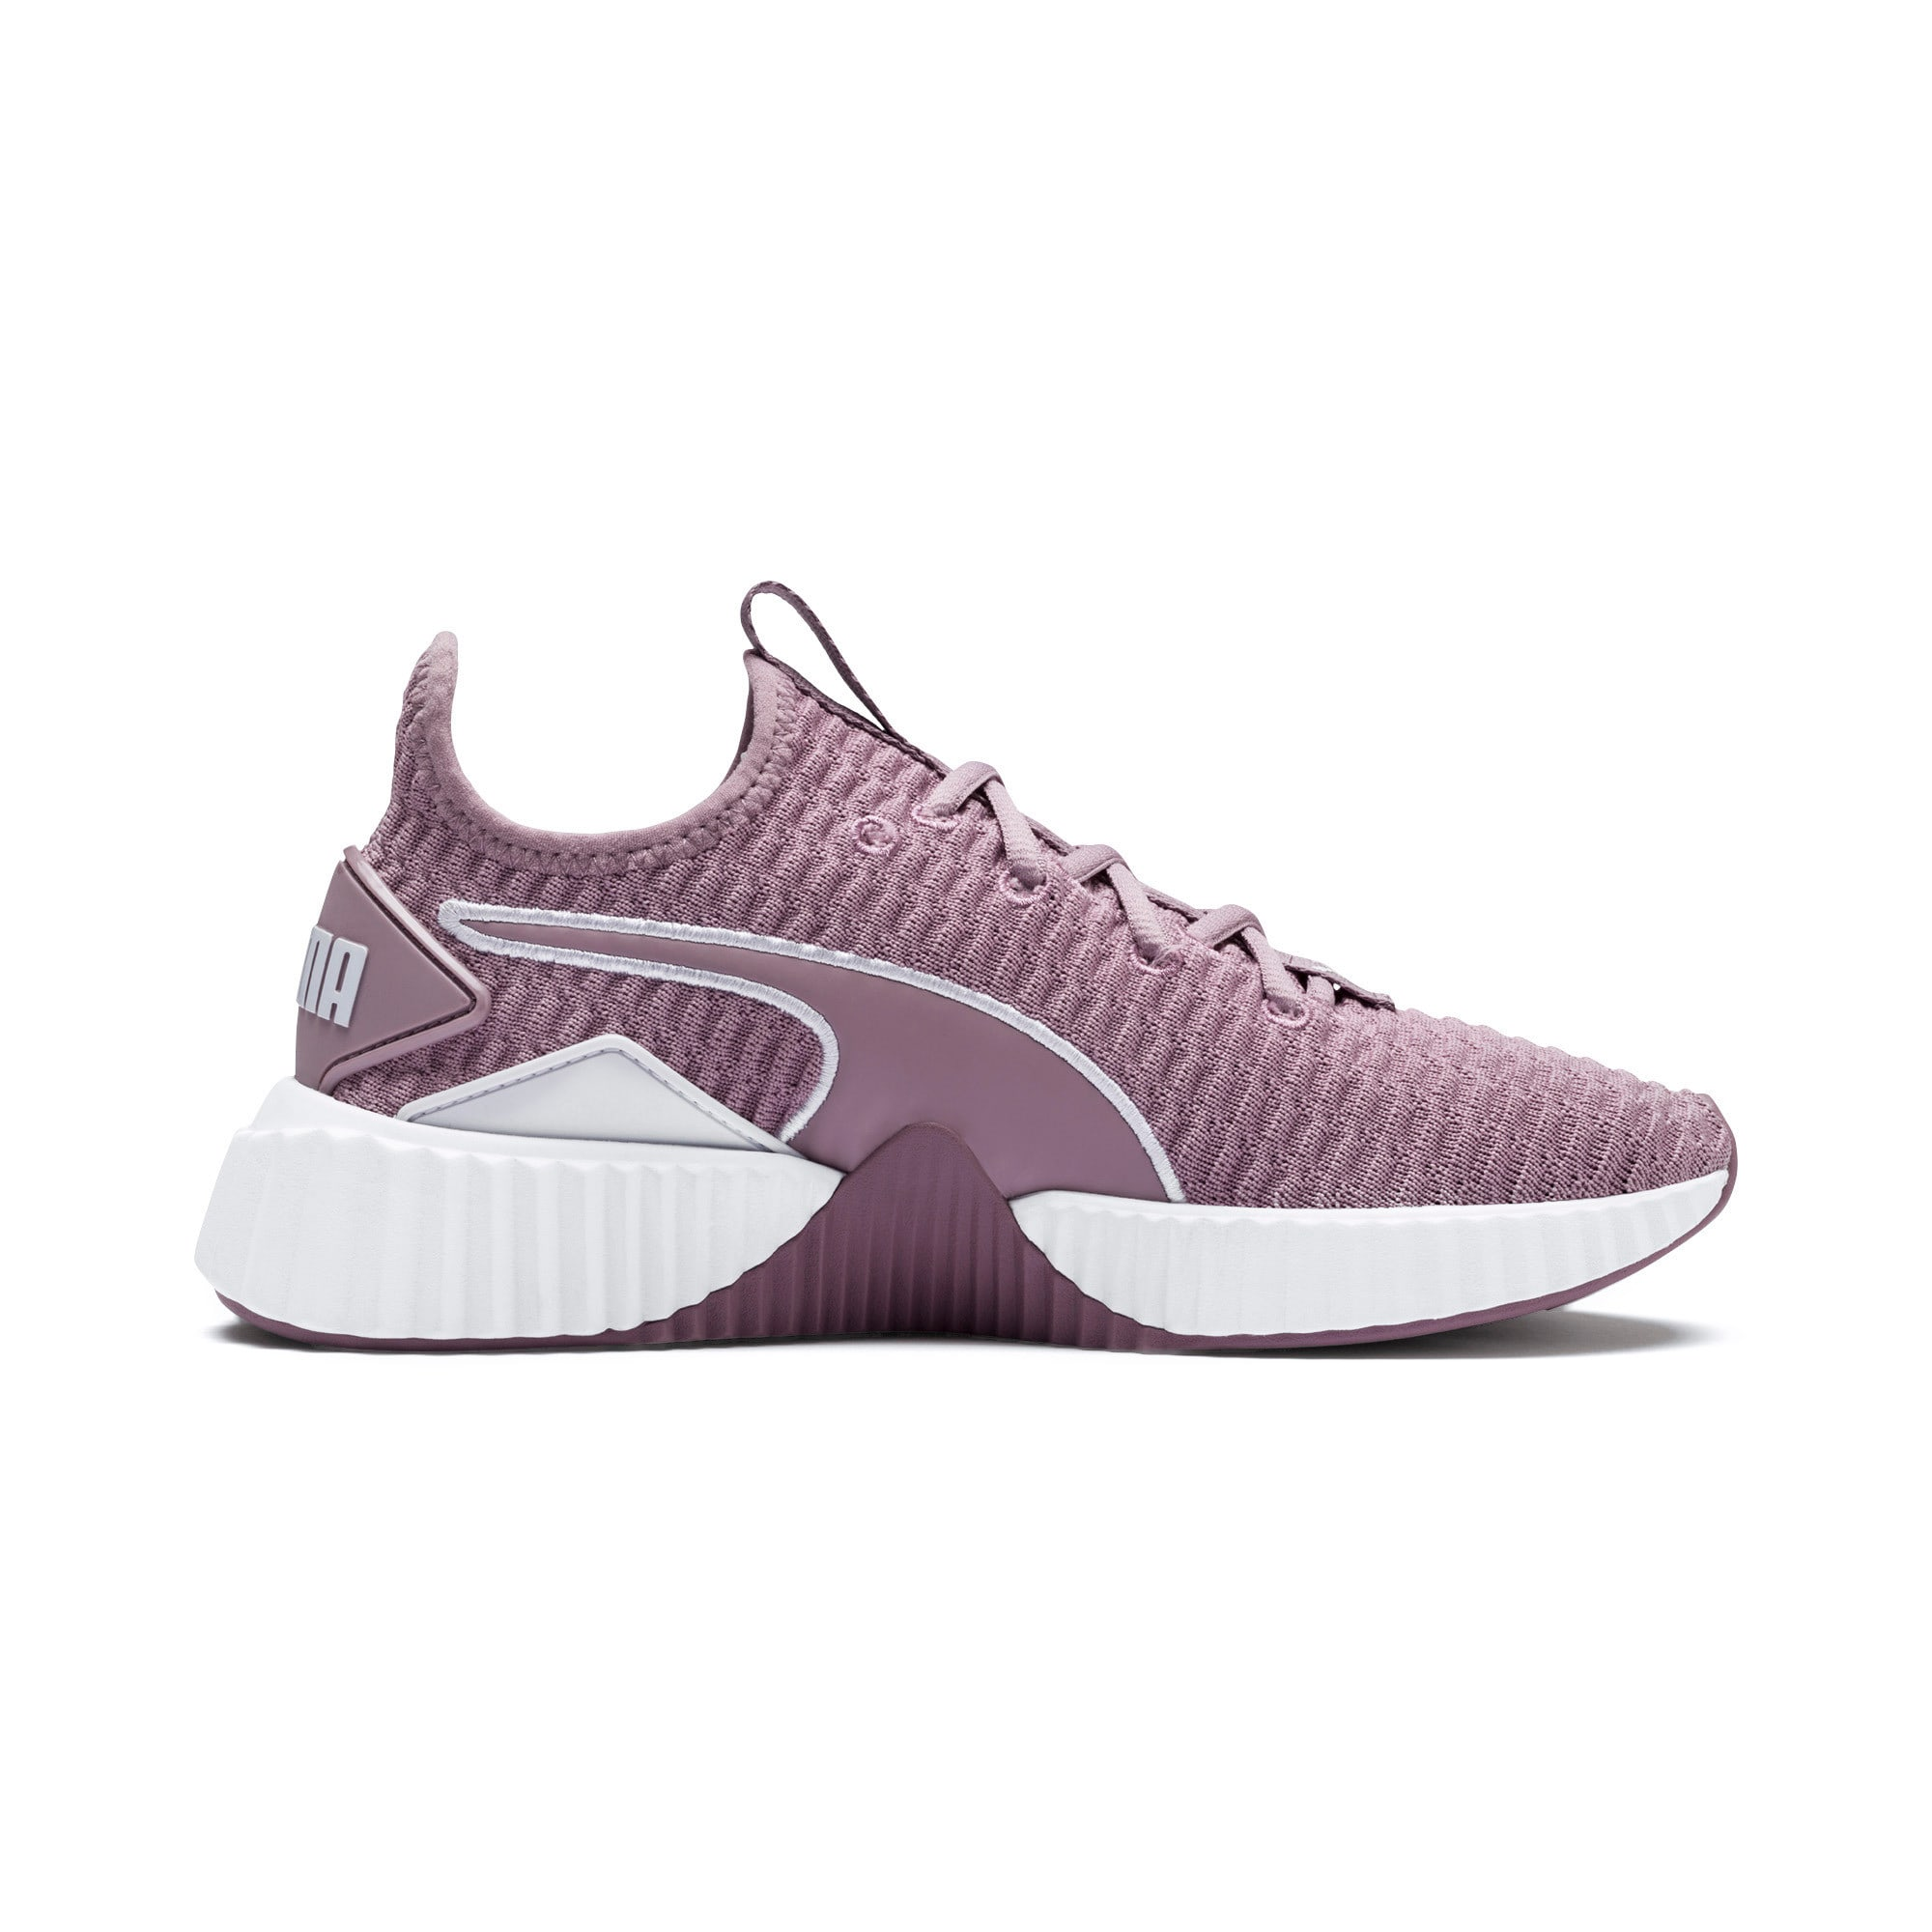 Thumbnail 5 of Defy Women's Training Shoes, Elderberry-Puma White, medium